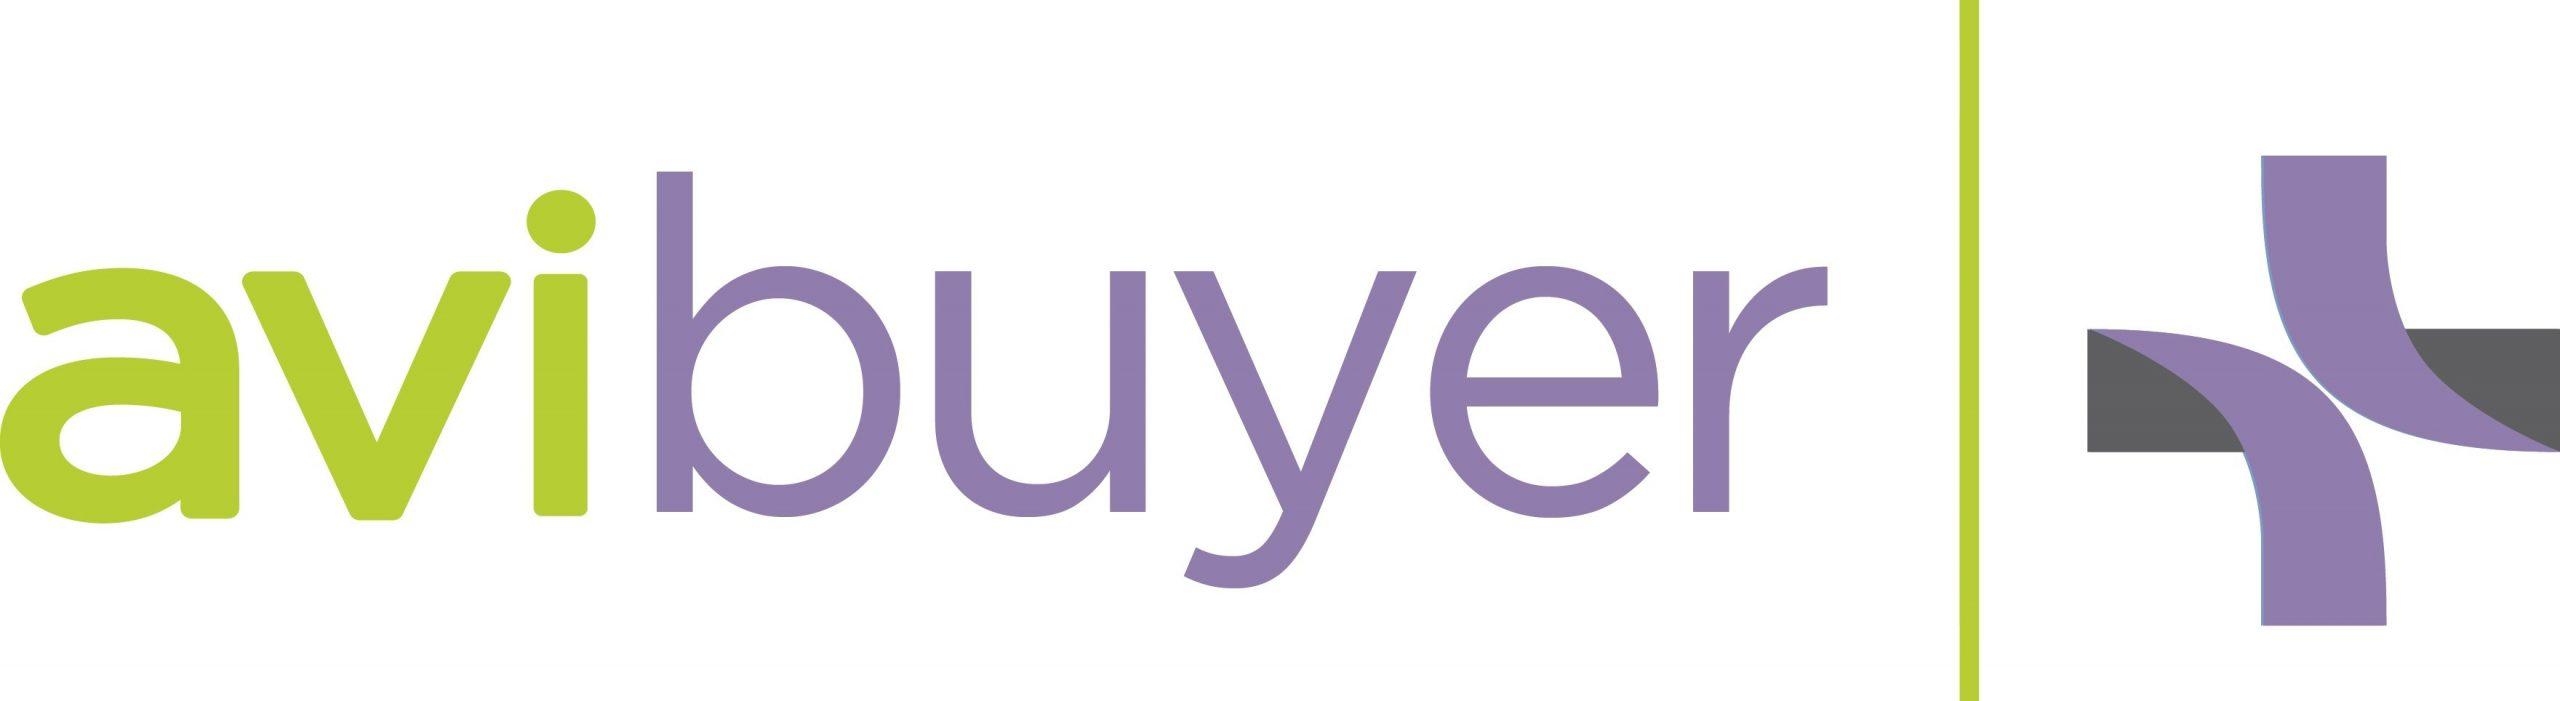 Avibuyer integration for RxWeb